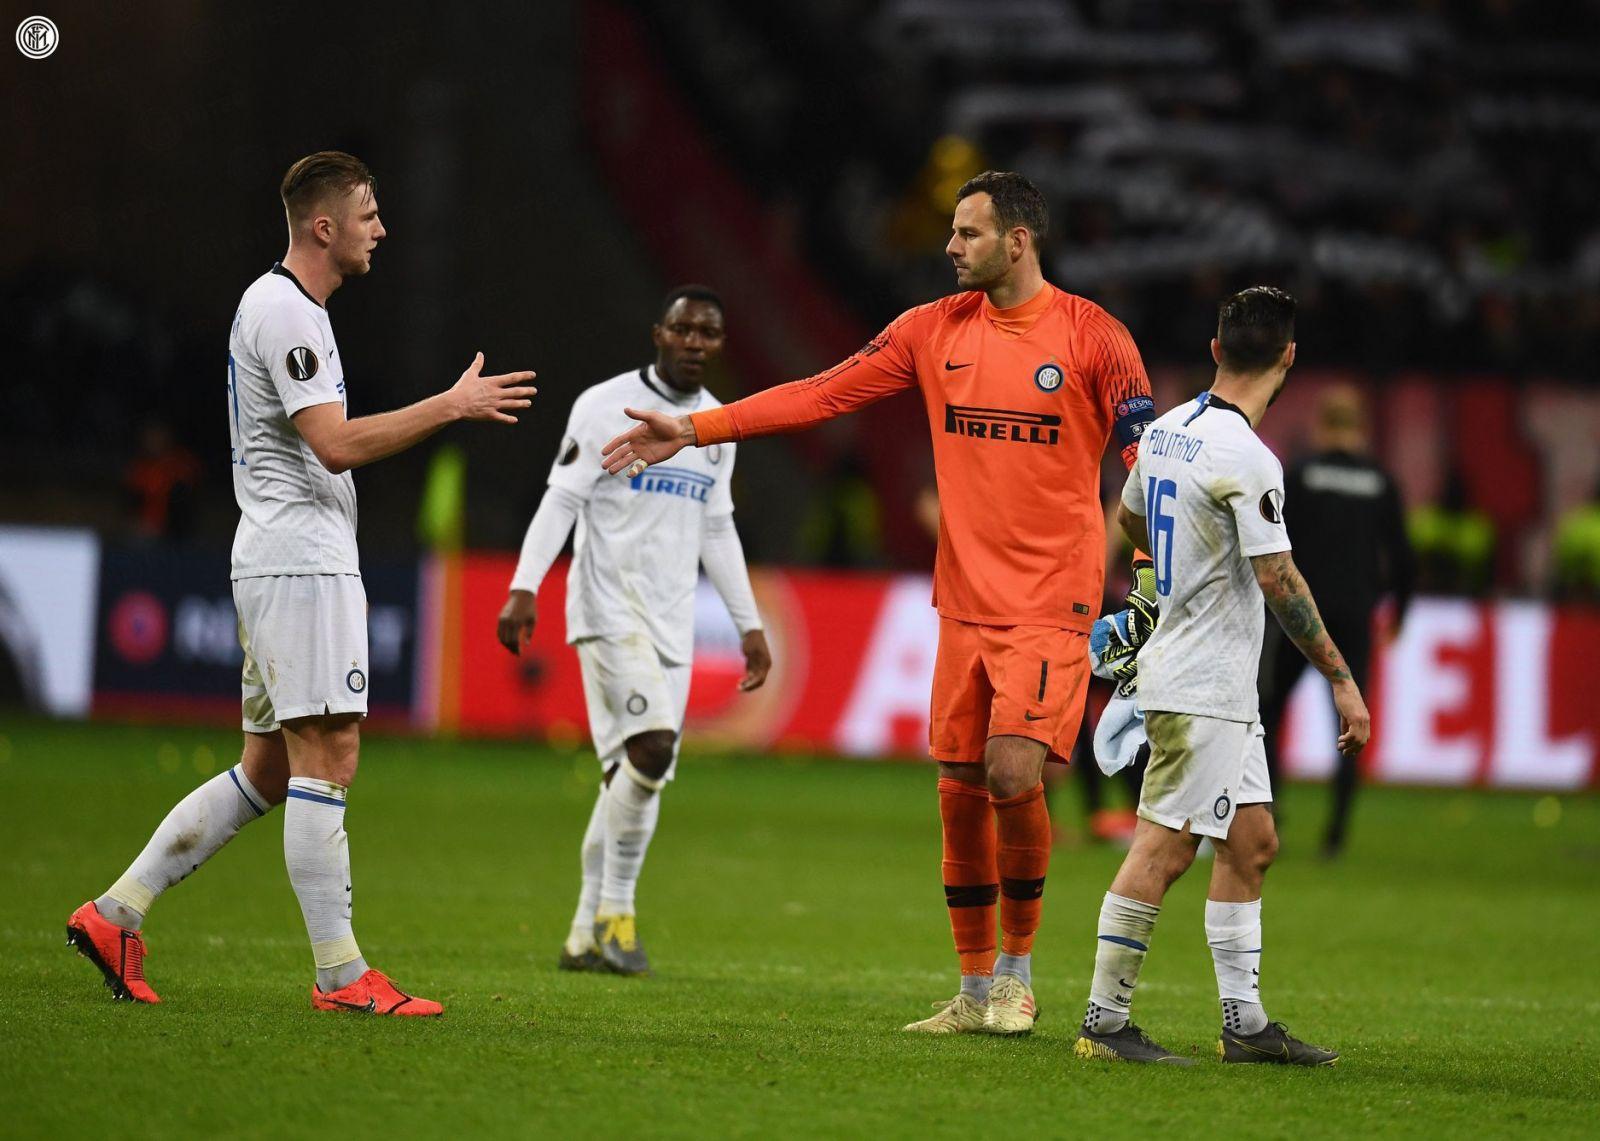 Eintracht Francoforte vs Inter